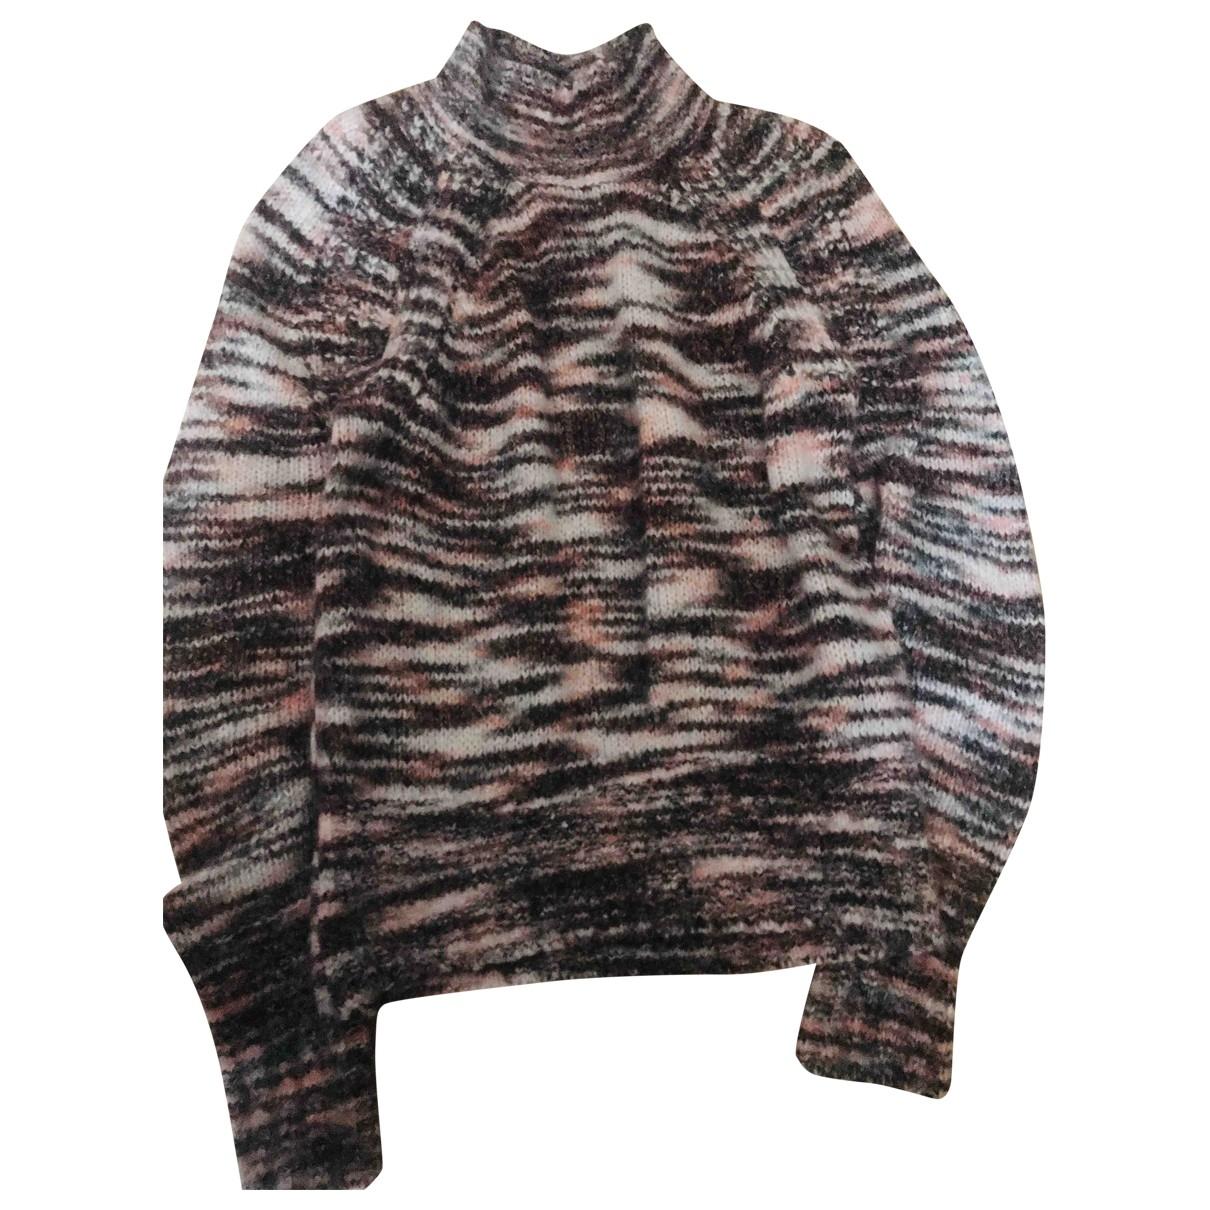 Burberry \N Cashmere Knitwear for Women XS International